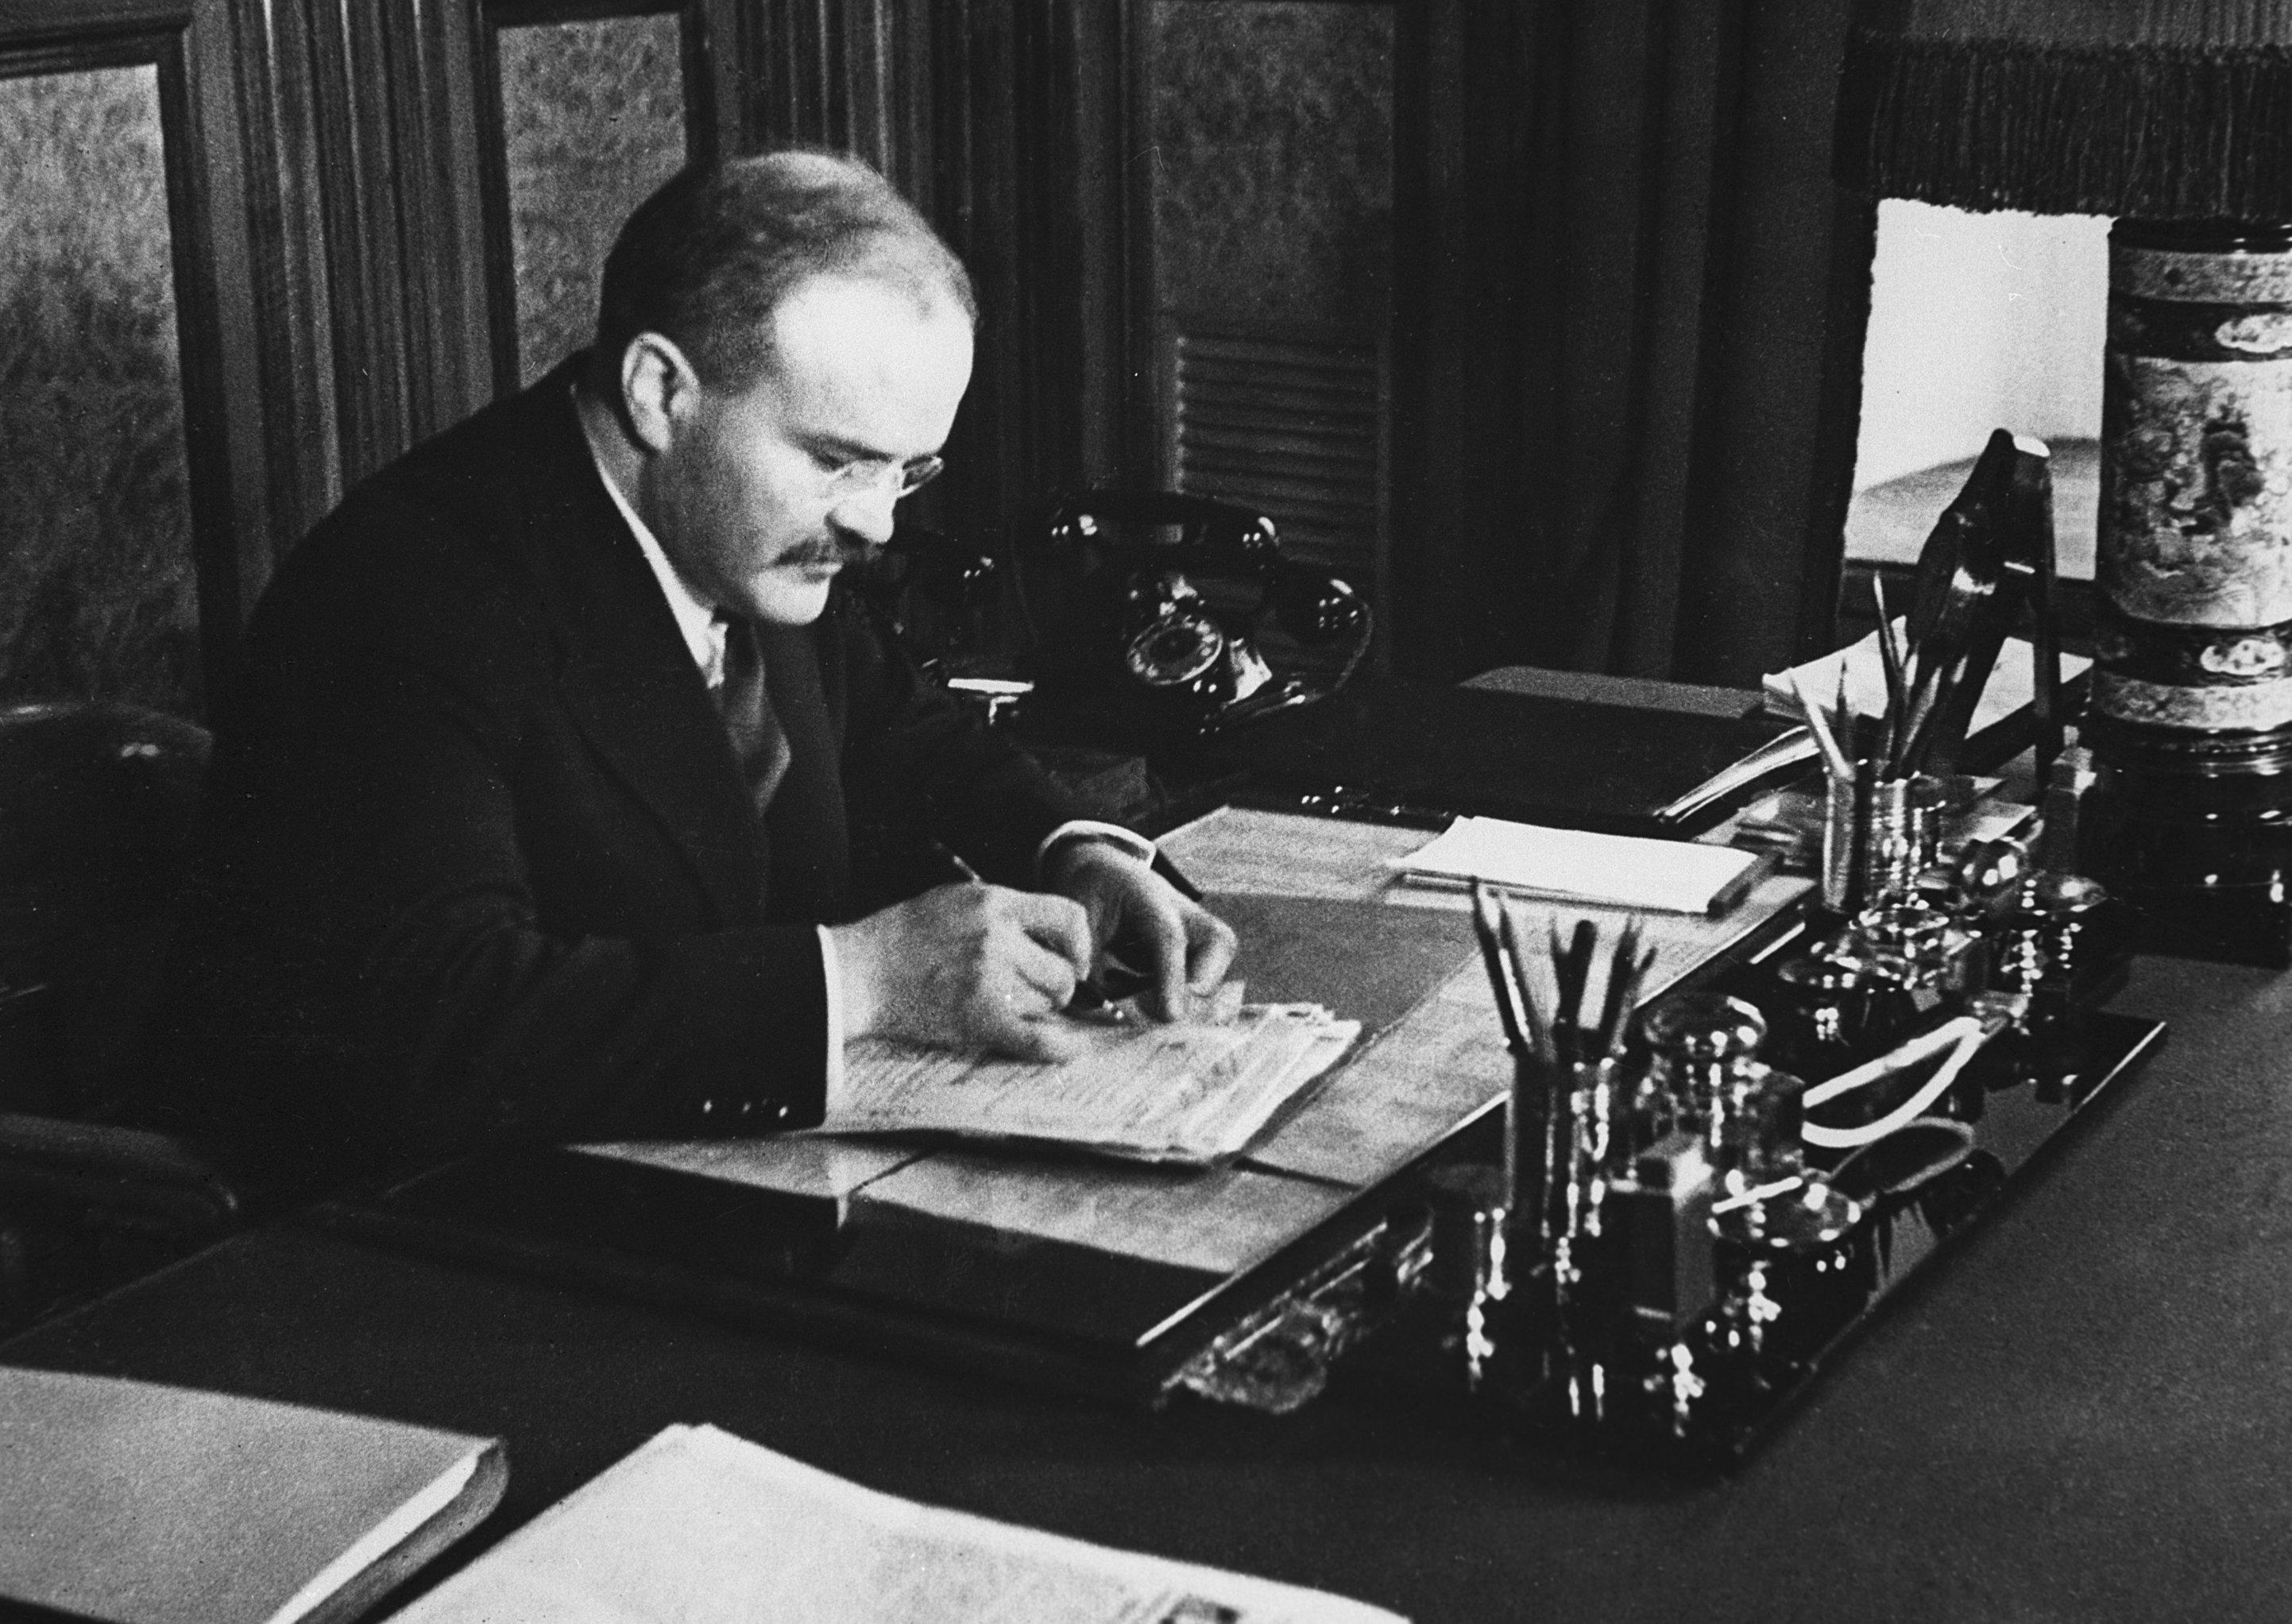 Vjačeslav Molotov (1890 - 1986), ministro degli affari esteri dell'URSS, al lavoro.